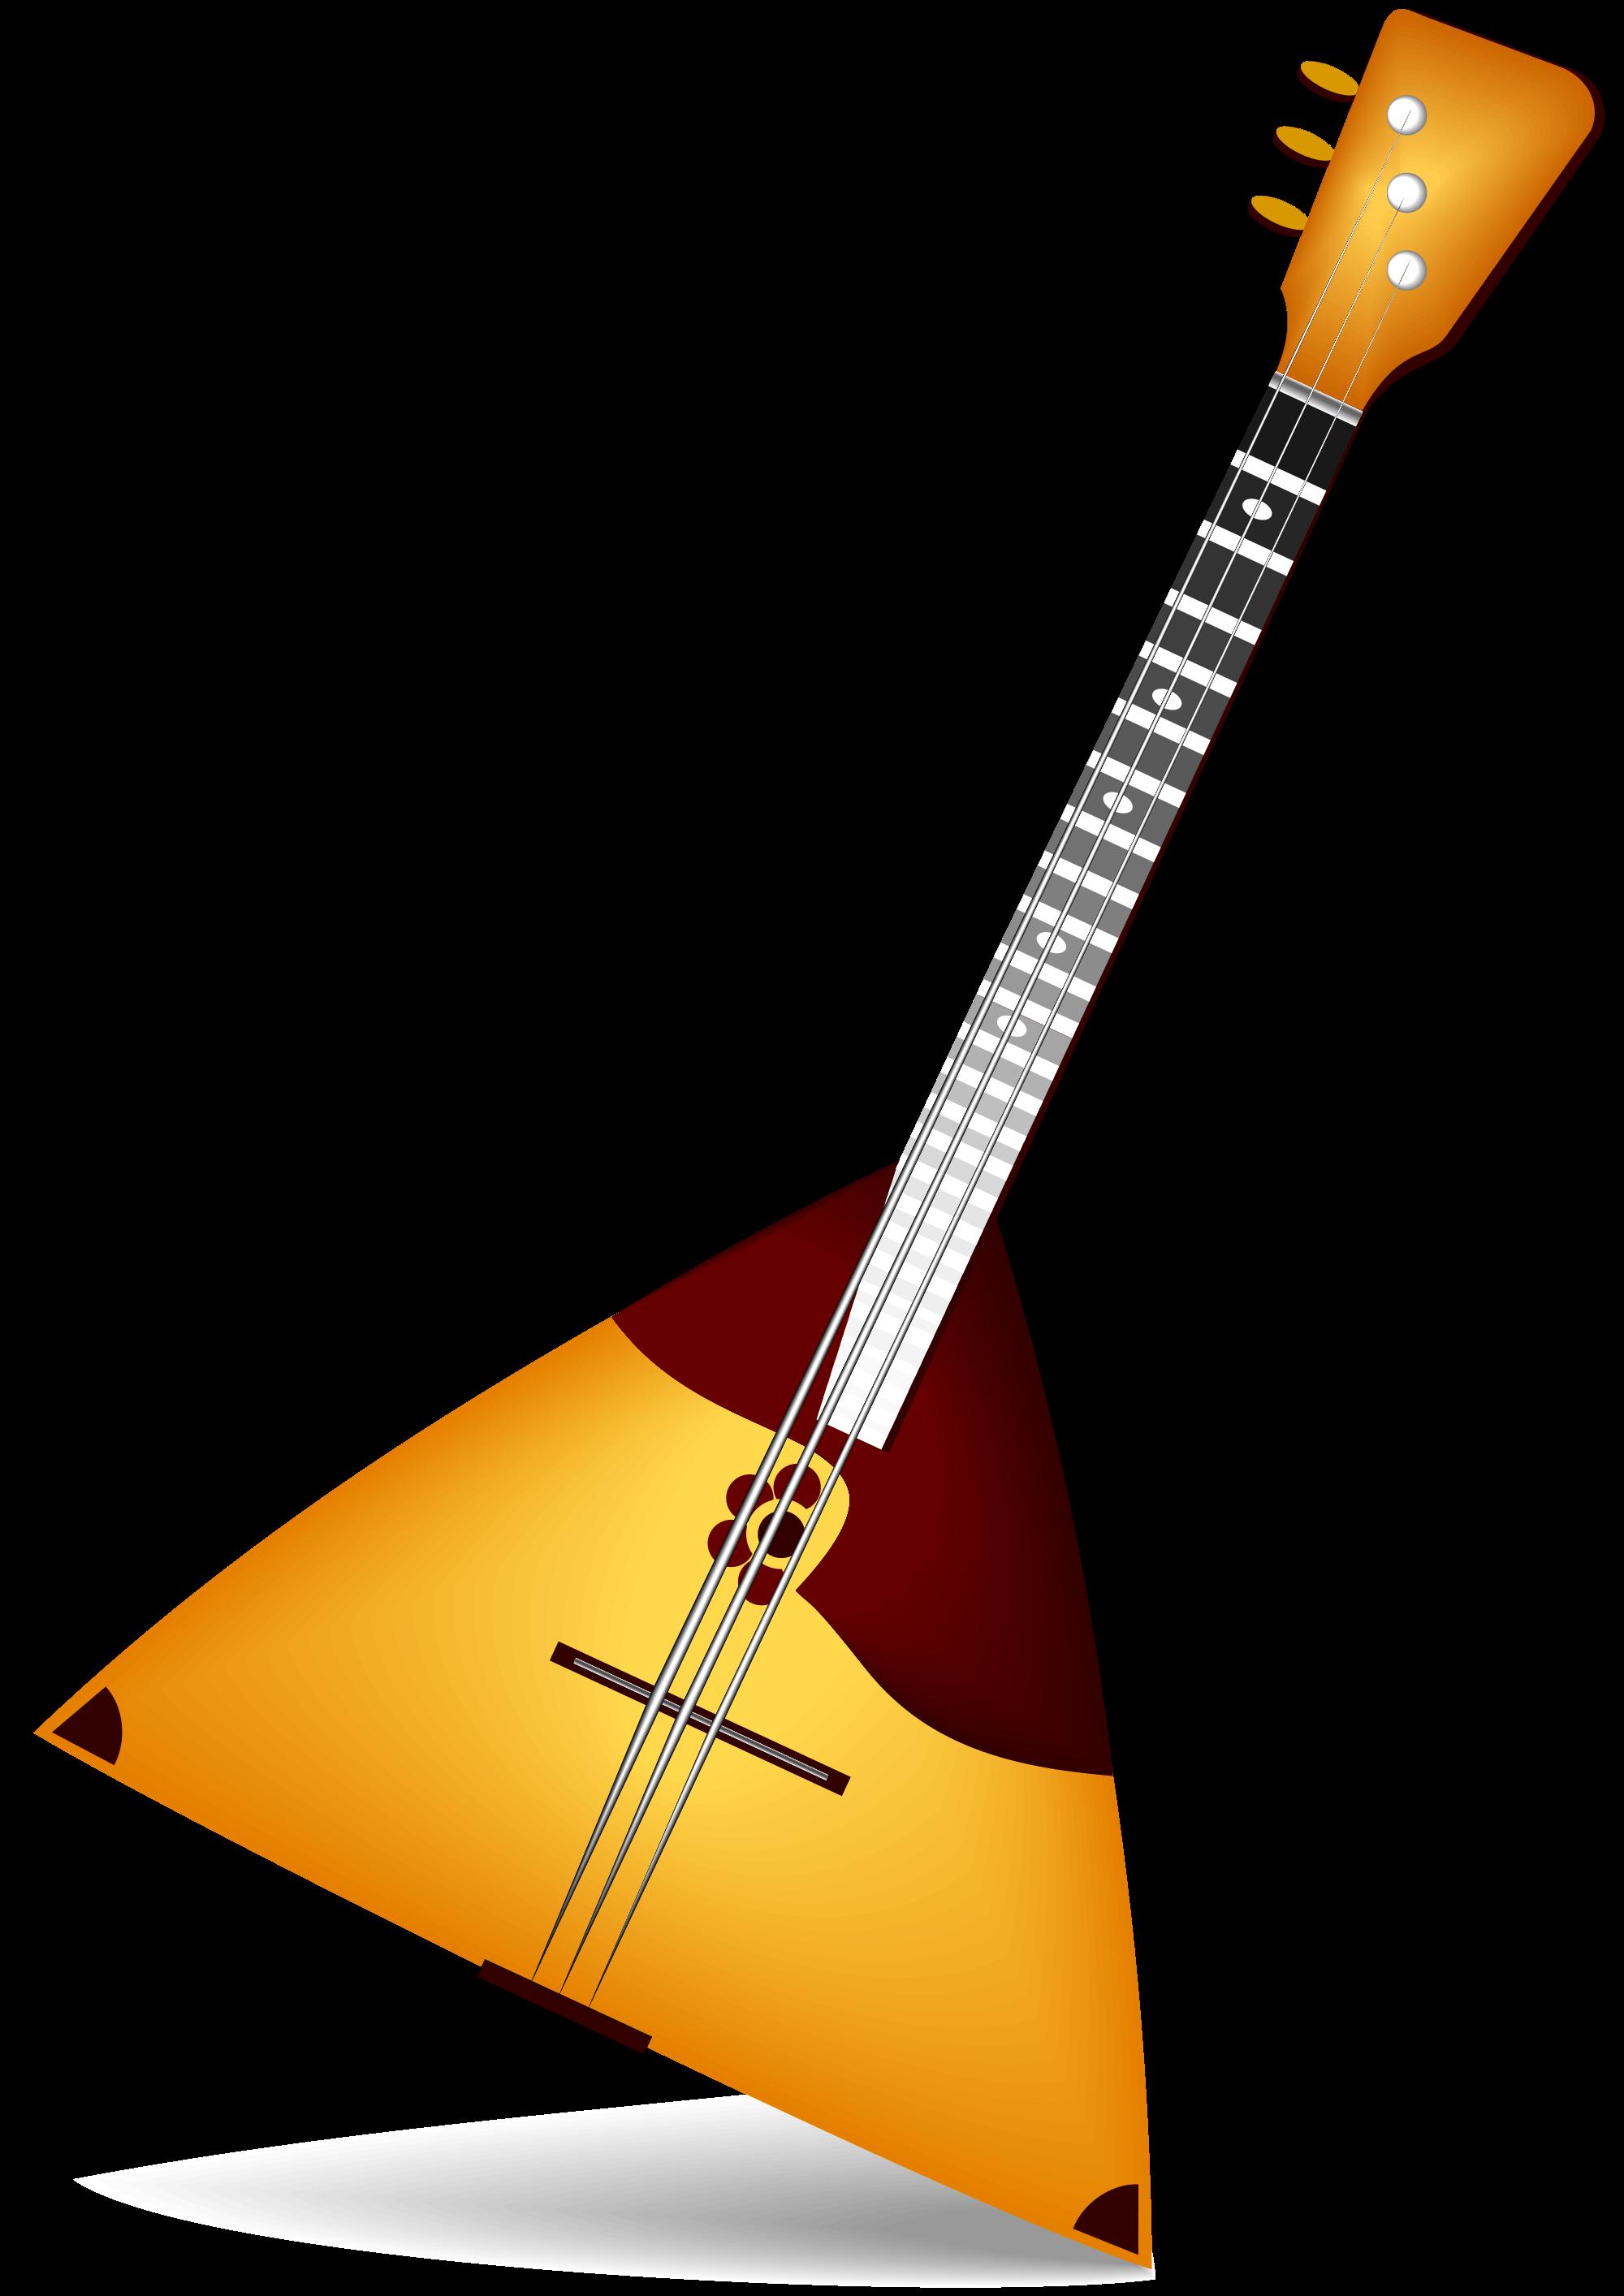 Wikipedia the free encyclopedia. Clipart guitar balalaika